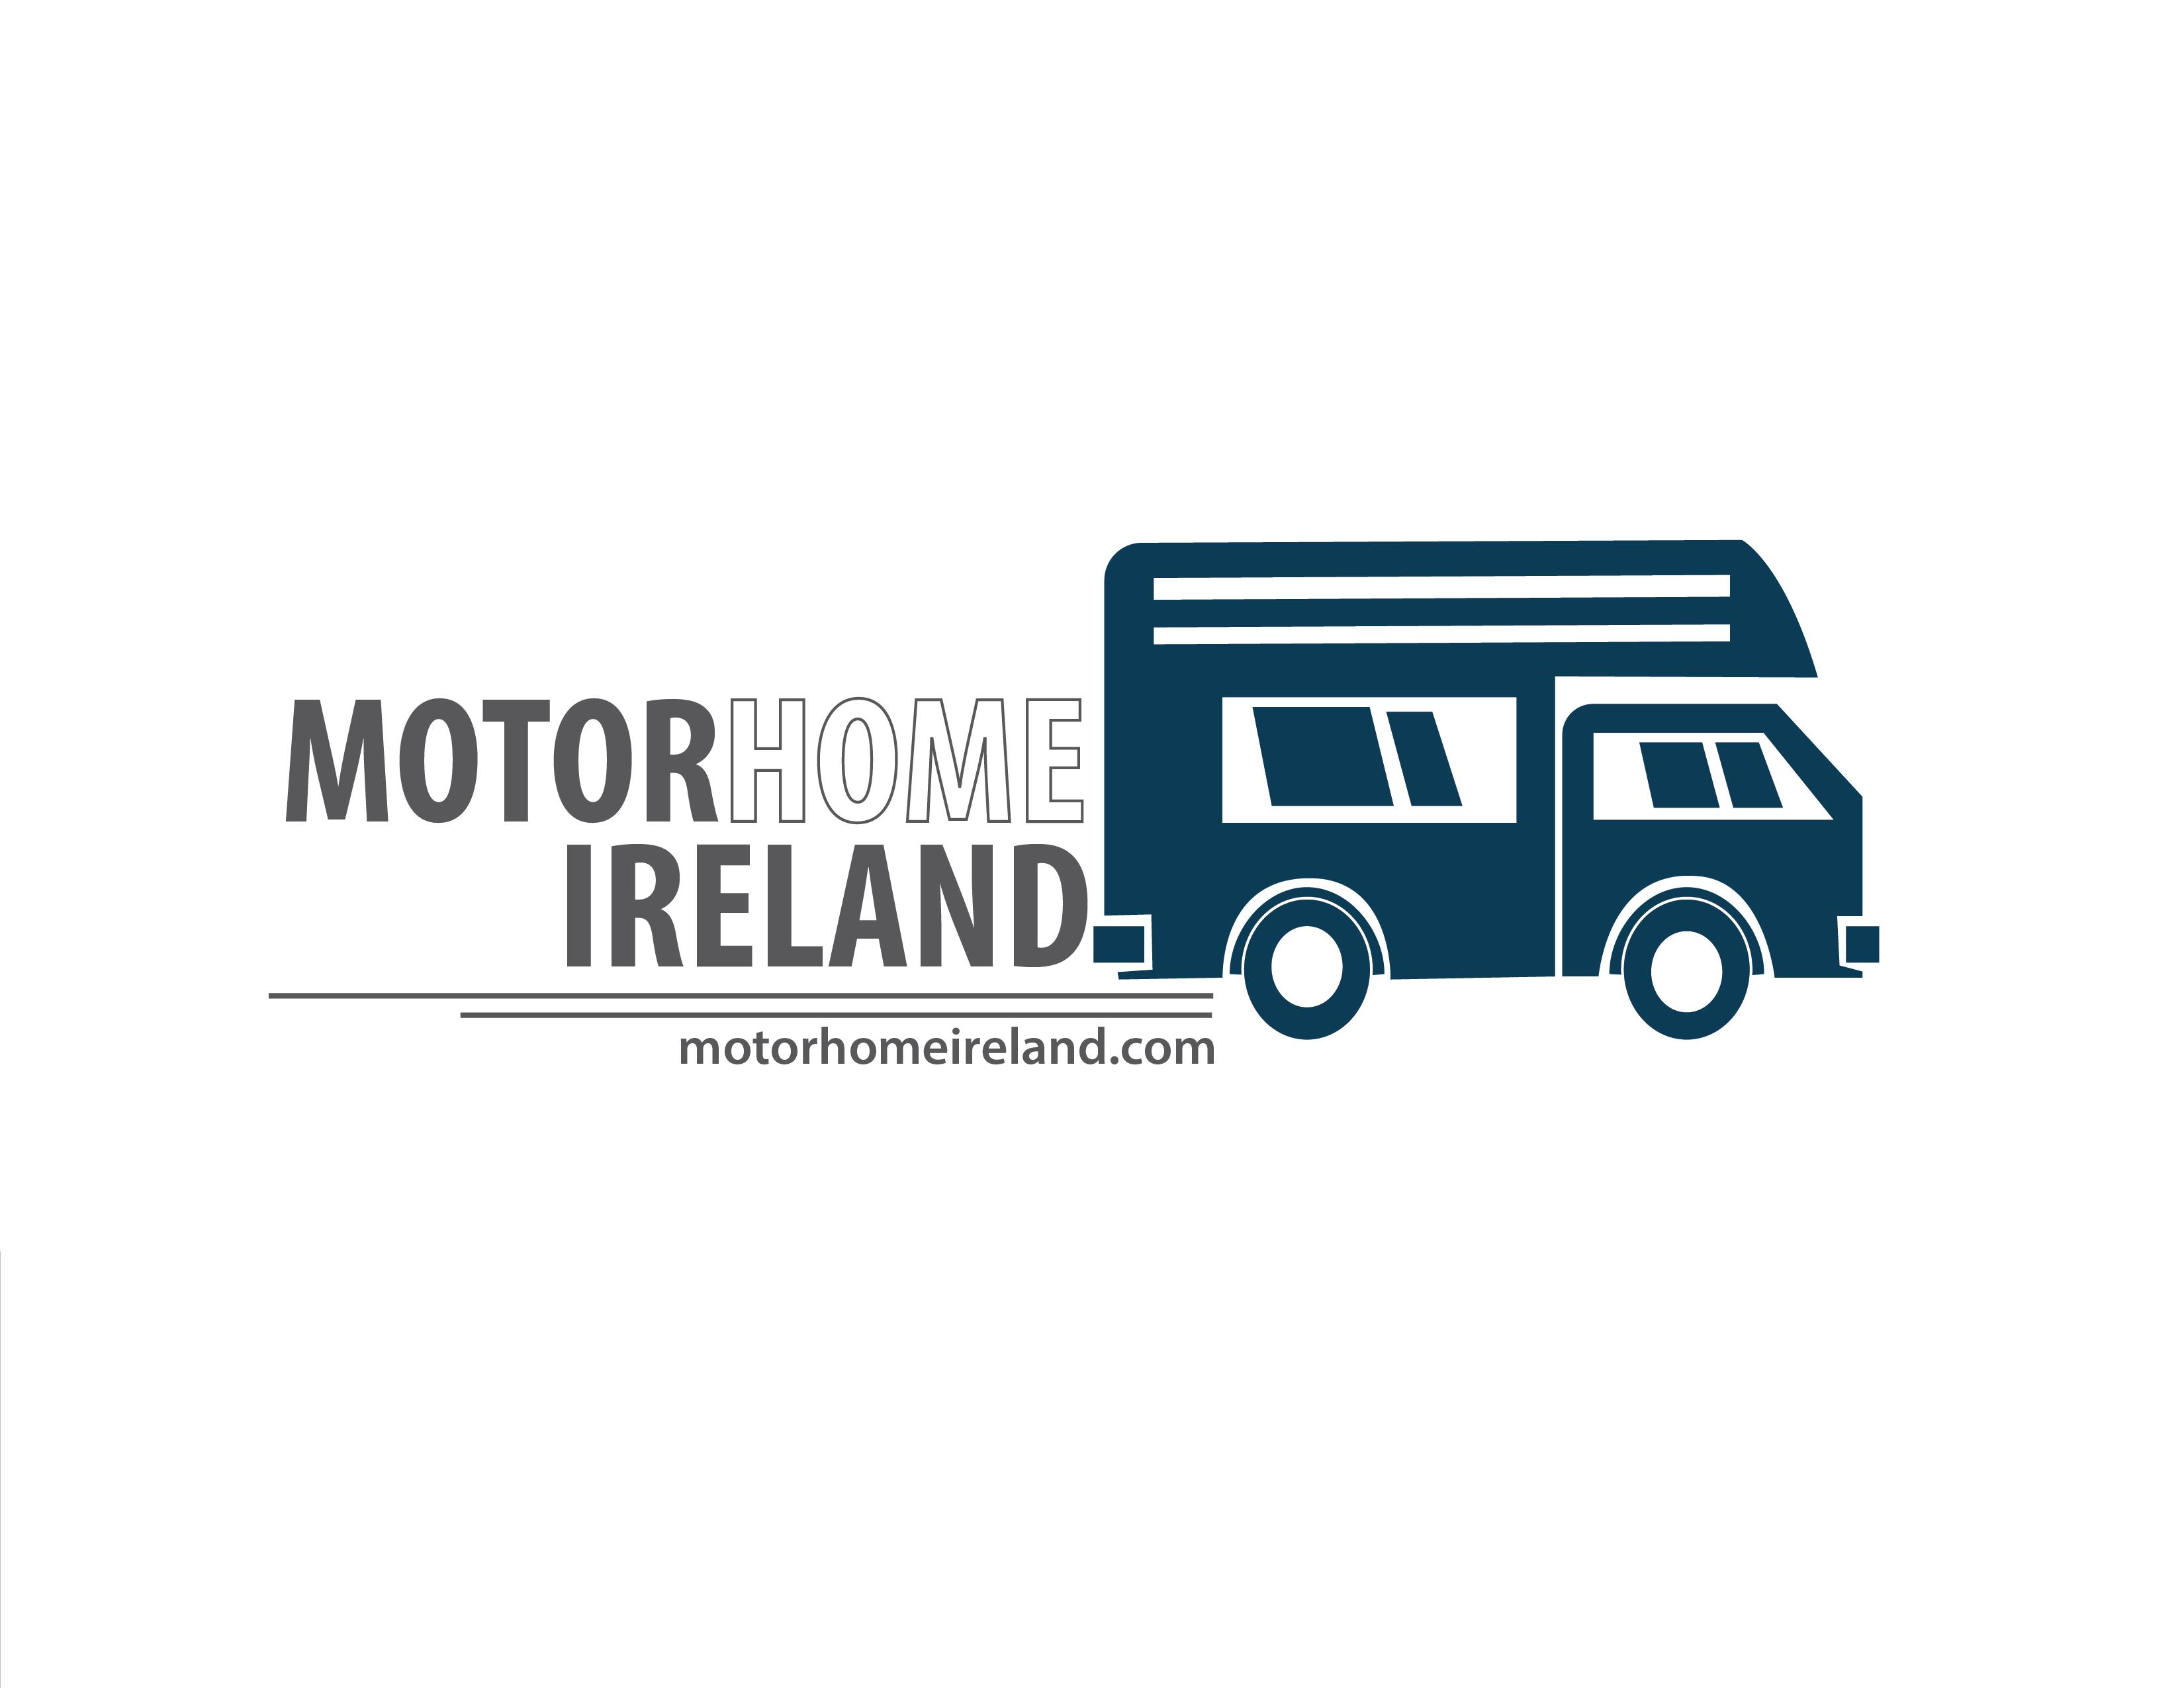 Motorhome Ireland